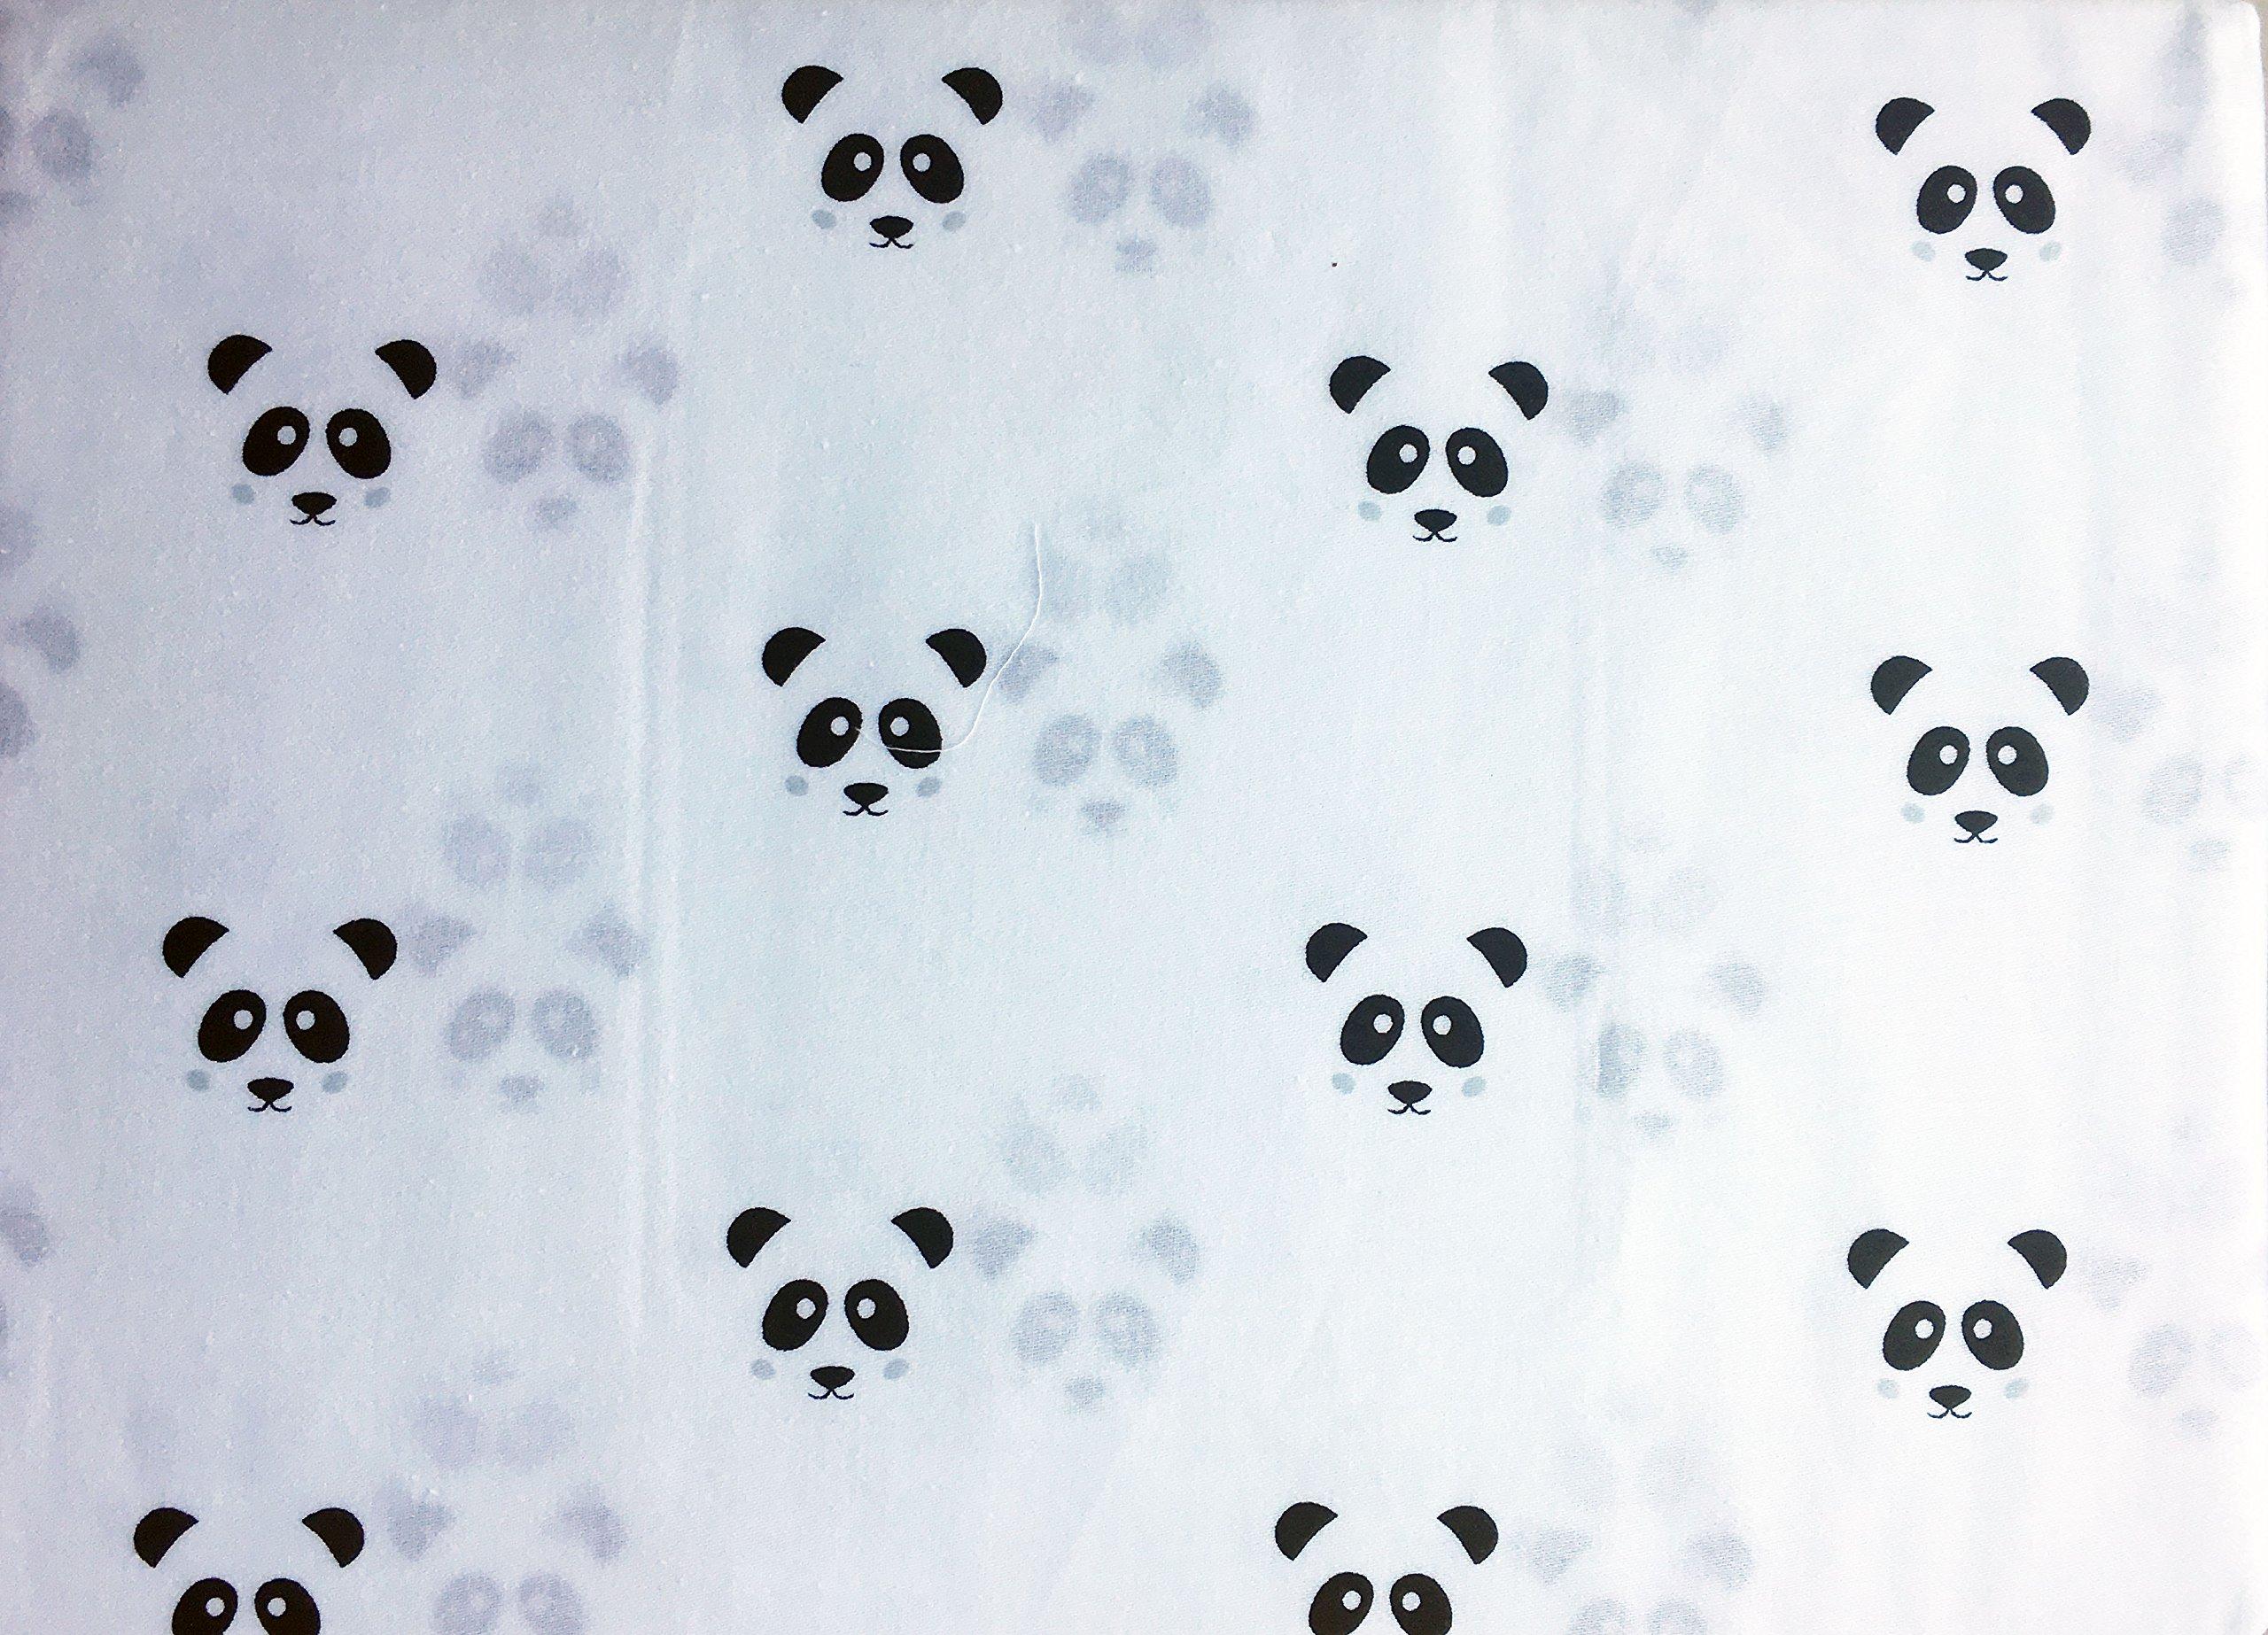 Little Dreamers Bedding 4 Piece Cotton Full Sheet Set Double Bed Black Panda Bear Faces on White